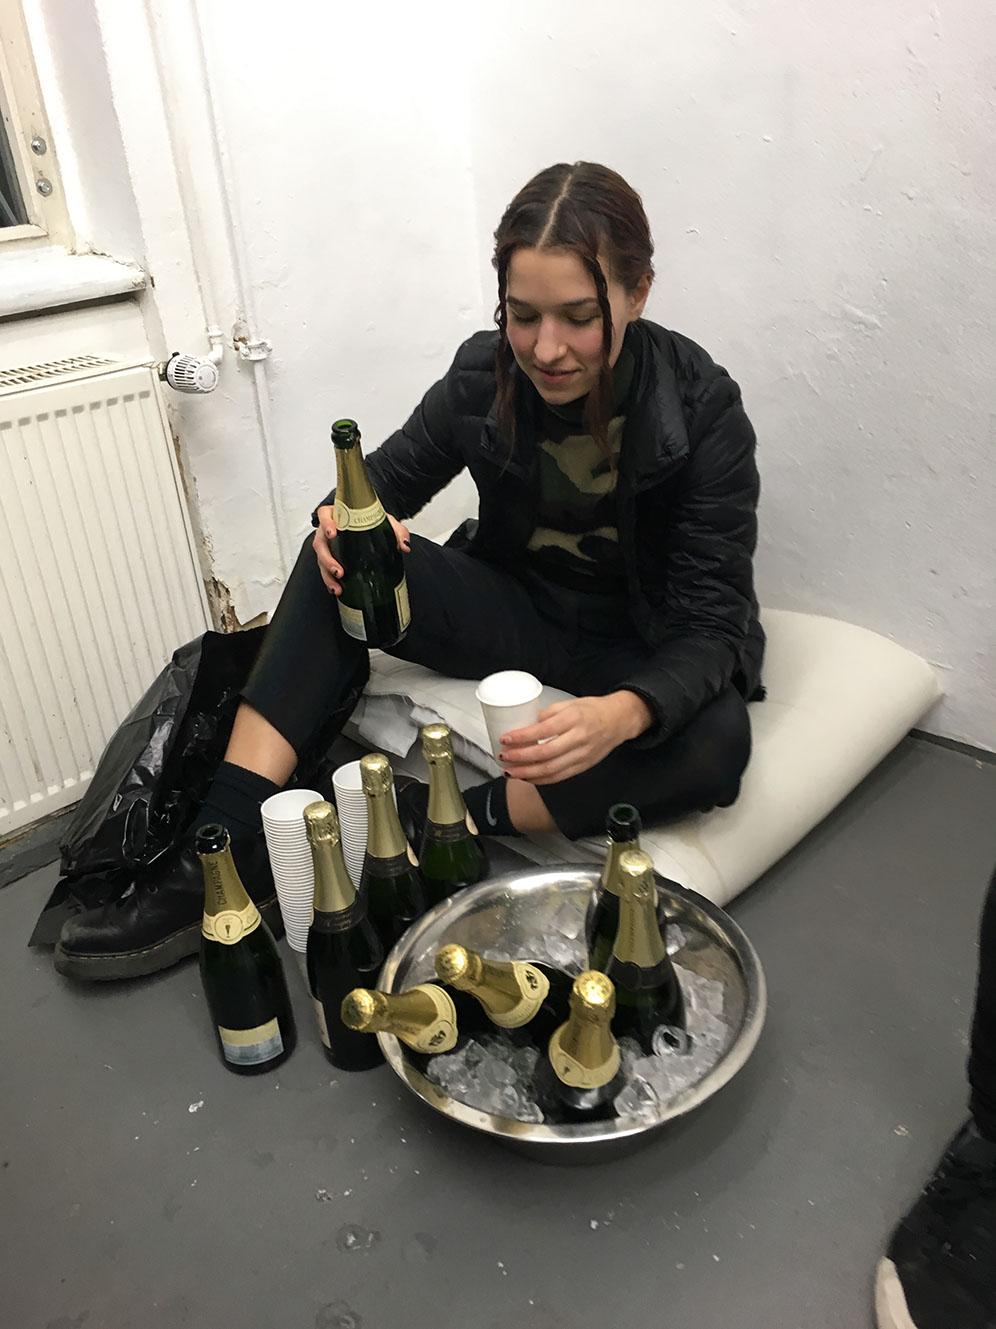 2018 Johanna Show Doku Max Eulitz WHATS LEFT10.jpg